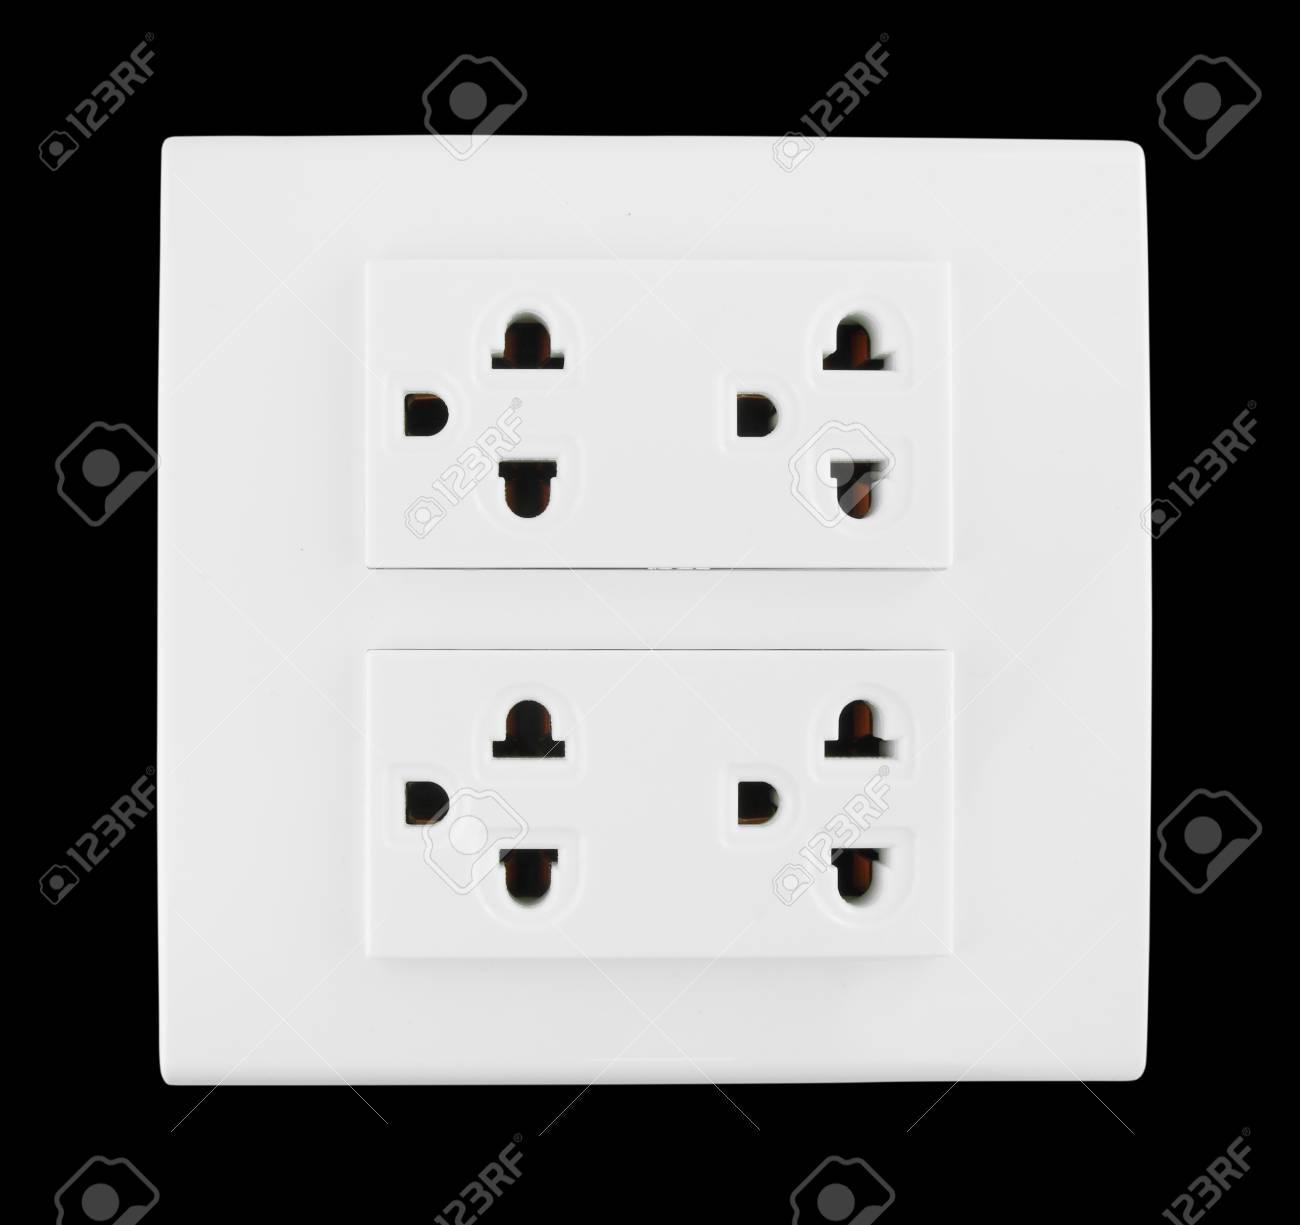 Electrical outlet (socket plug) on black background Stock Photo - 20446190